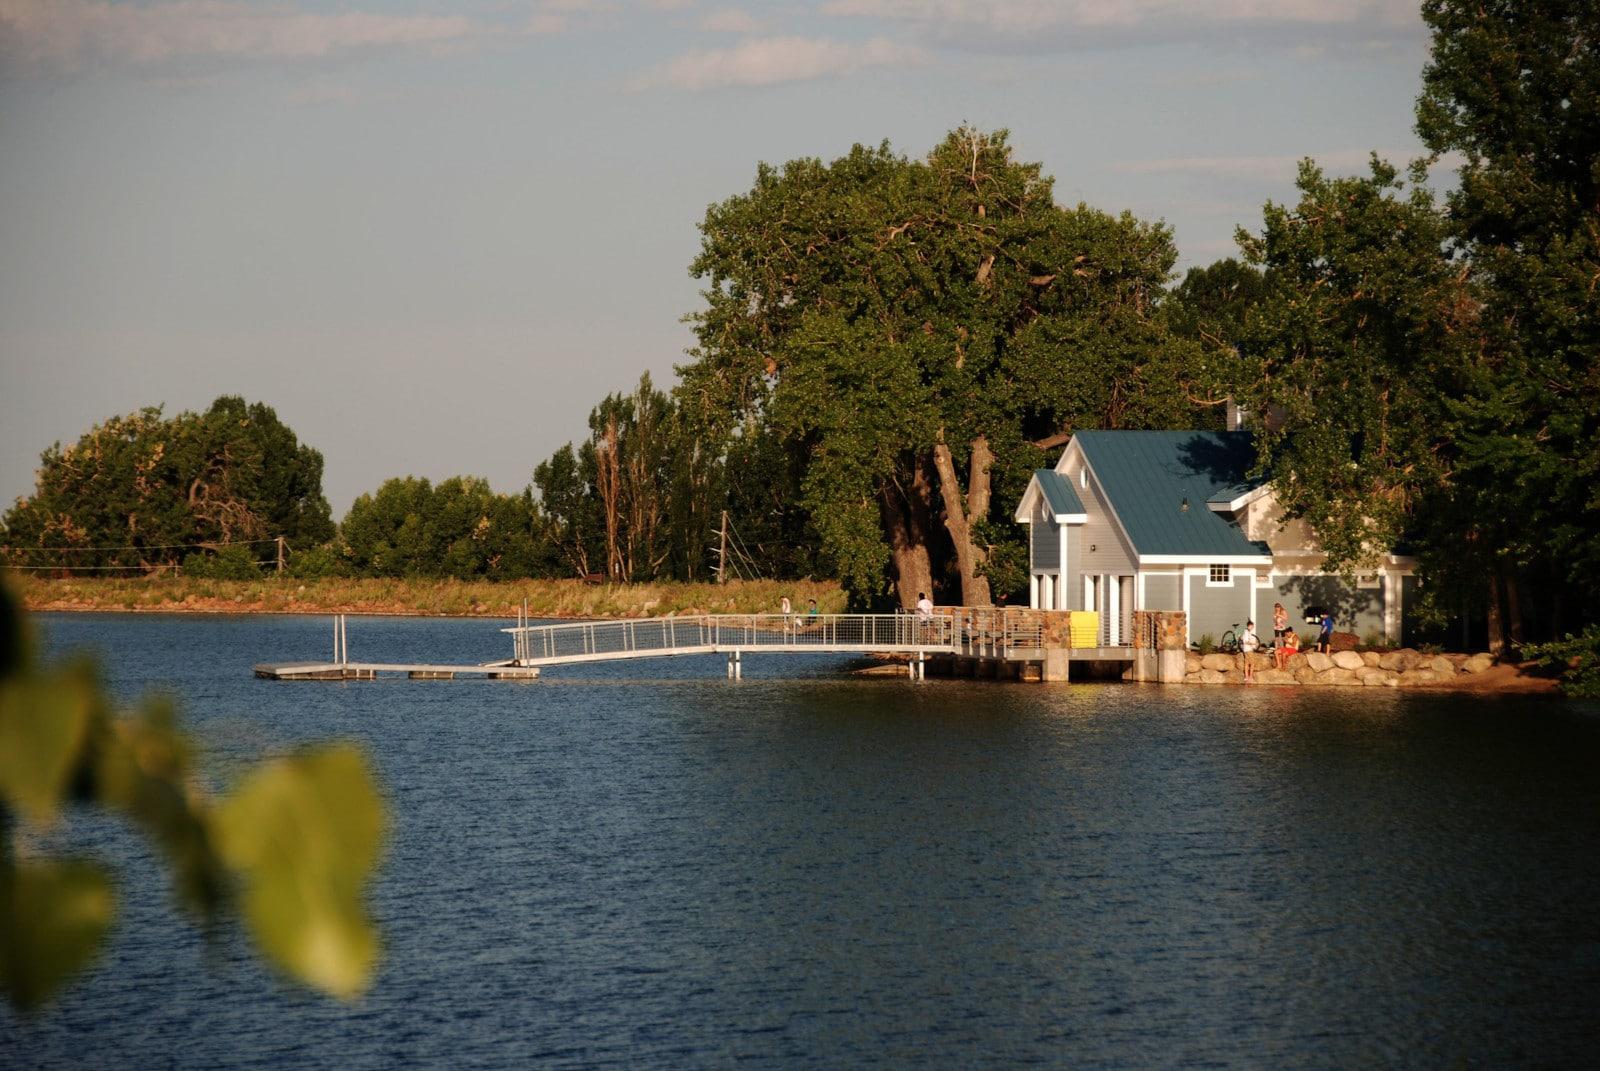 Image of the Waneka Lake boathouse in Lafayette, Colorado